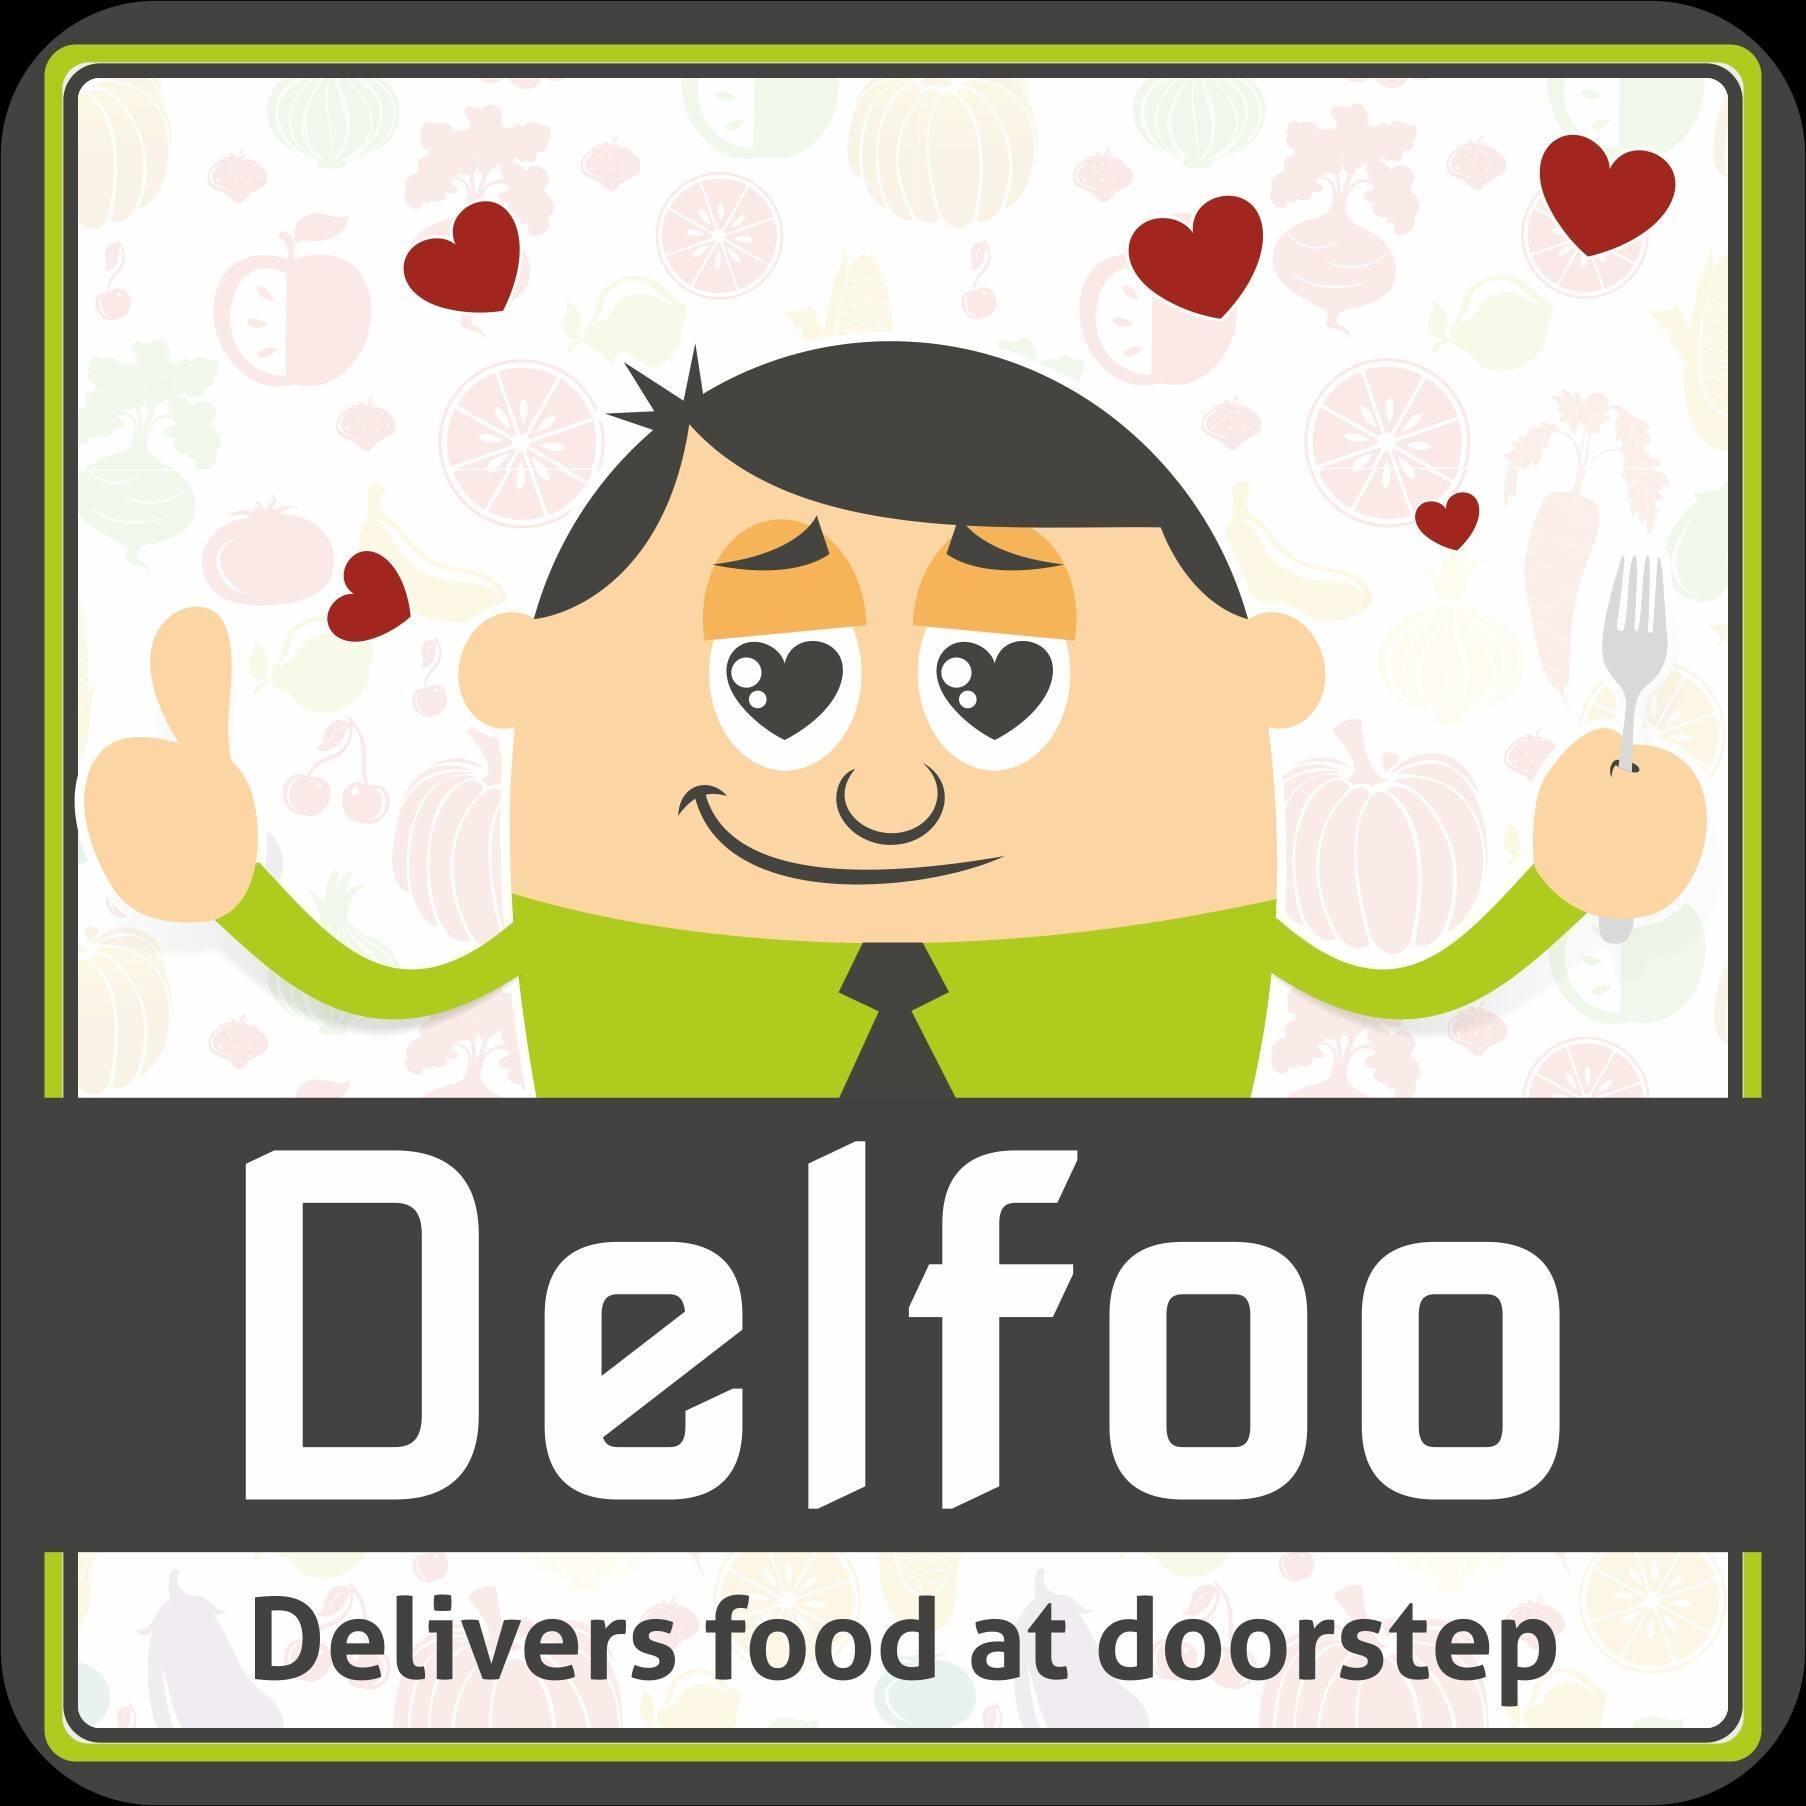 Delfoo